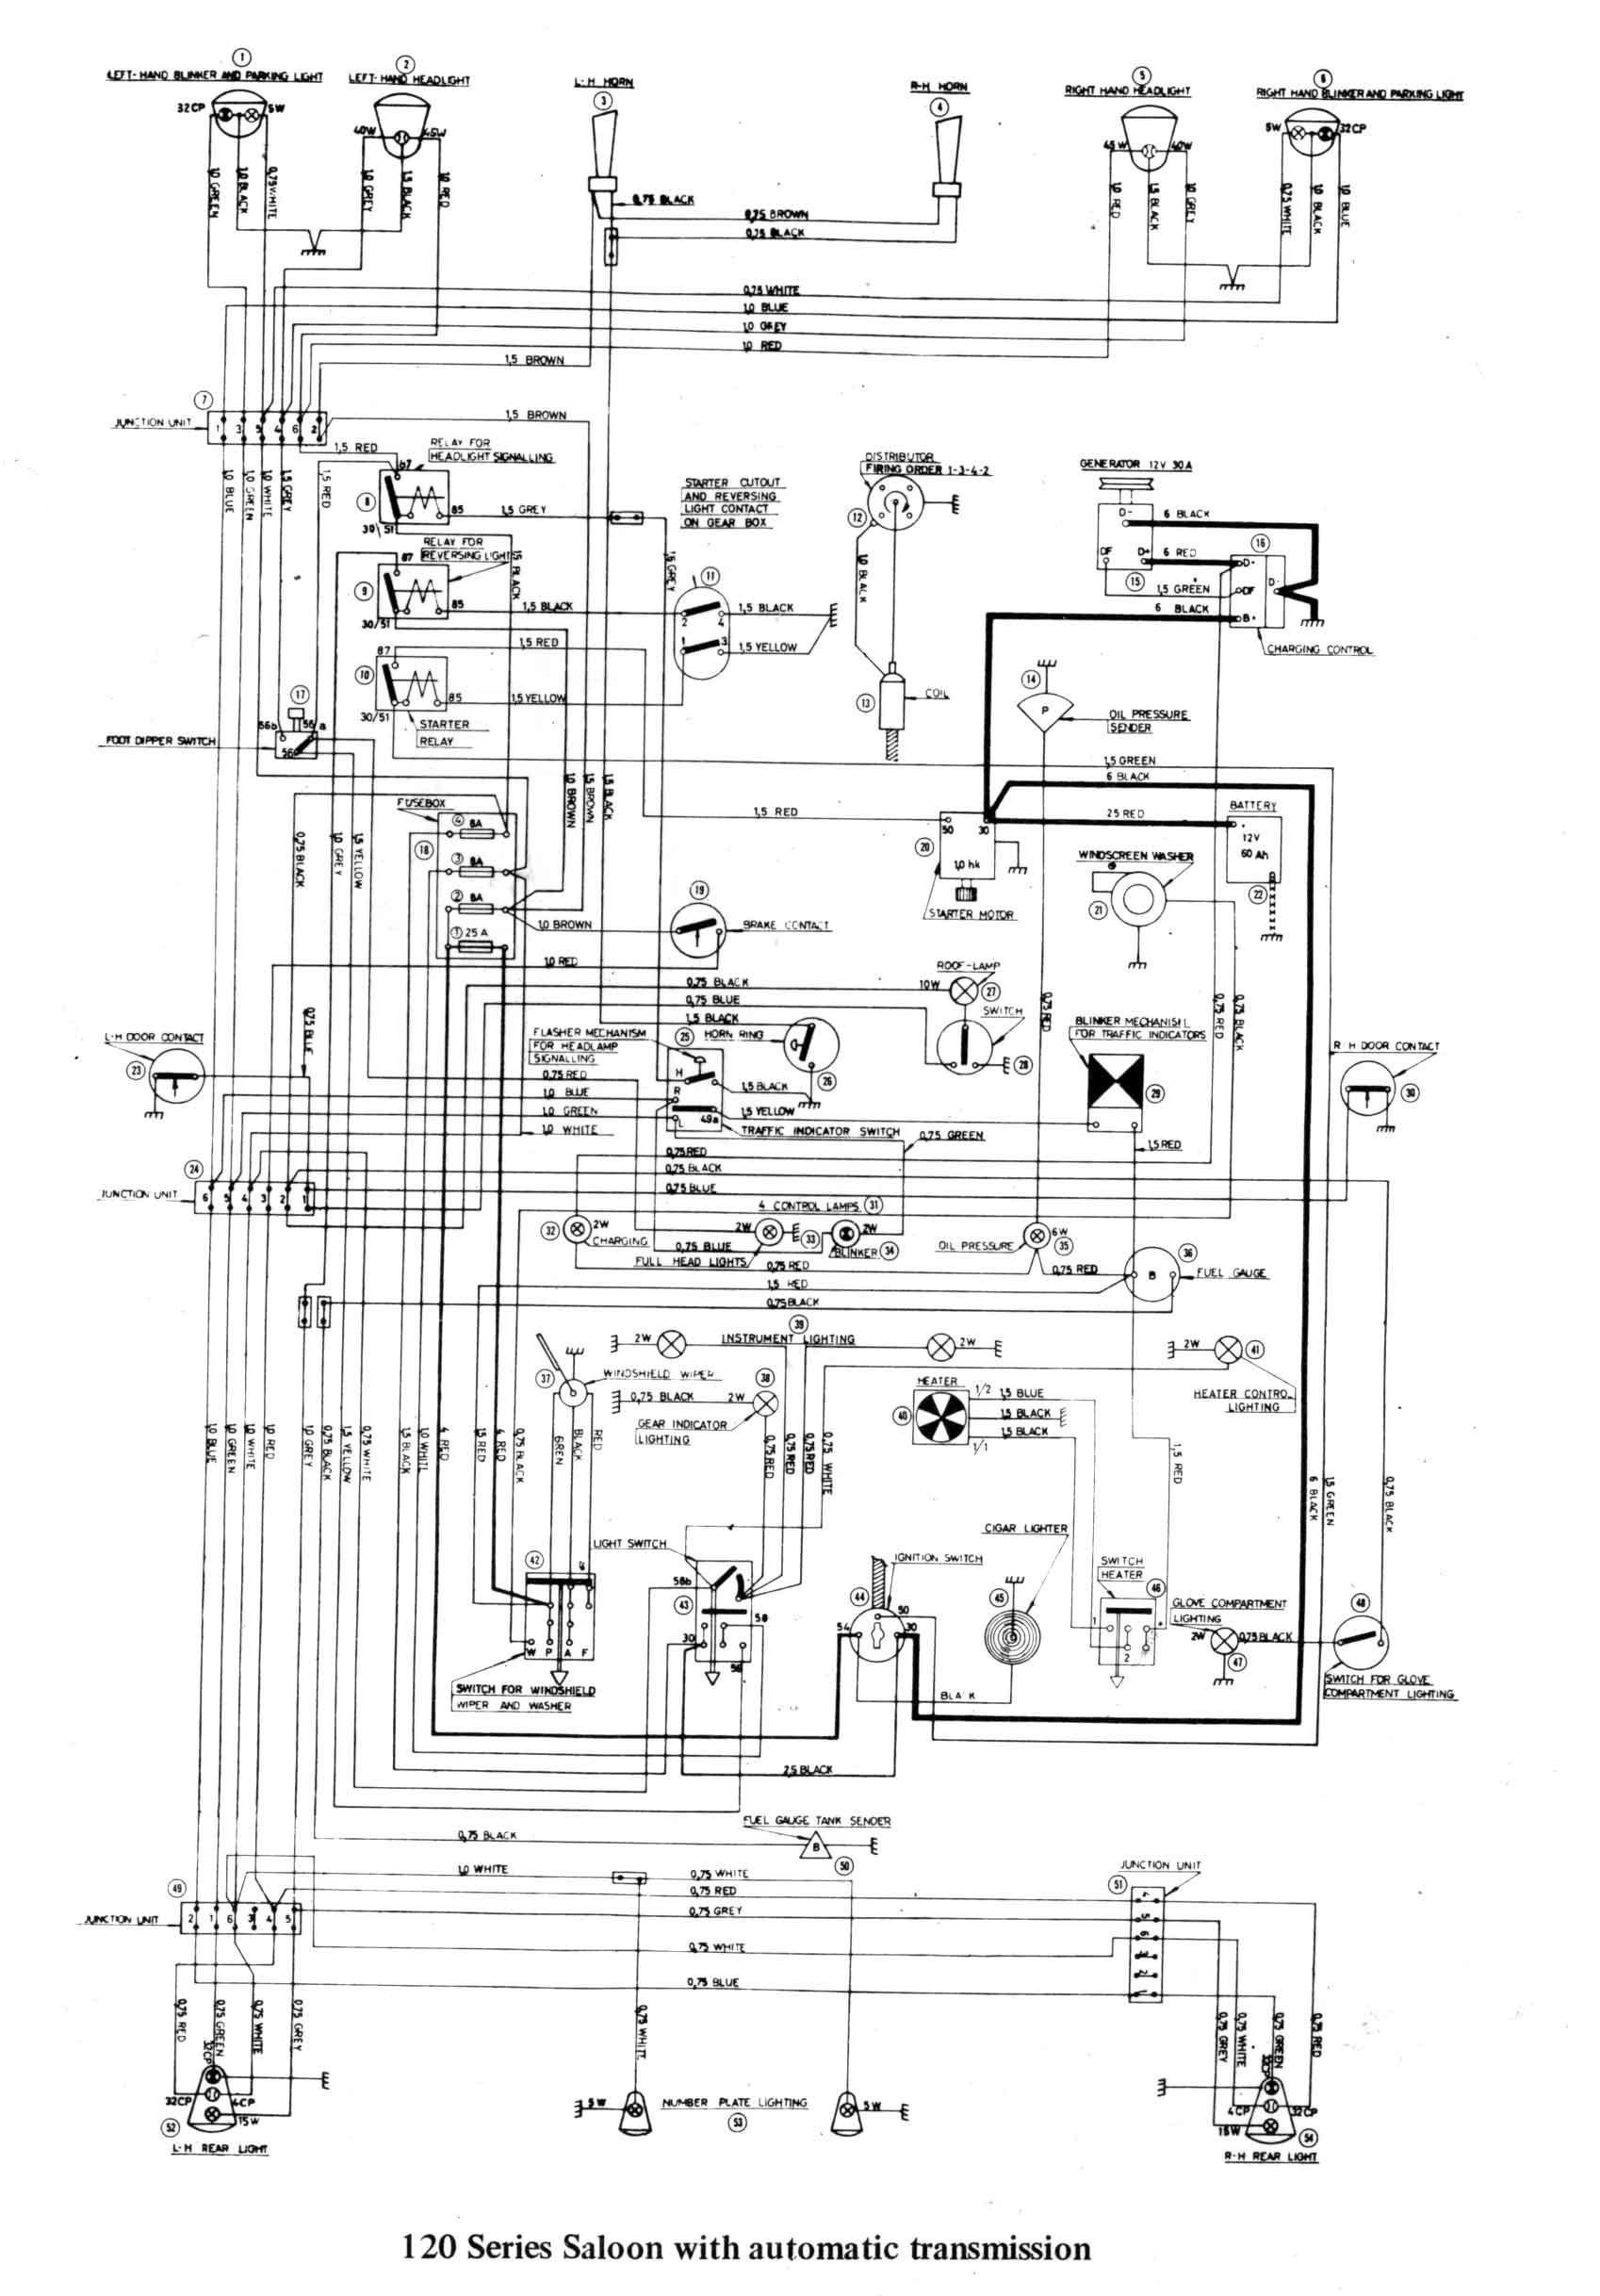 Typical Ac Wiring Diagram Fresh Electrical Wiring Diagram Lovely Sw Em Od Retrofitting A Vintage